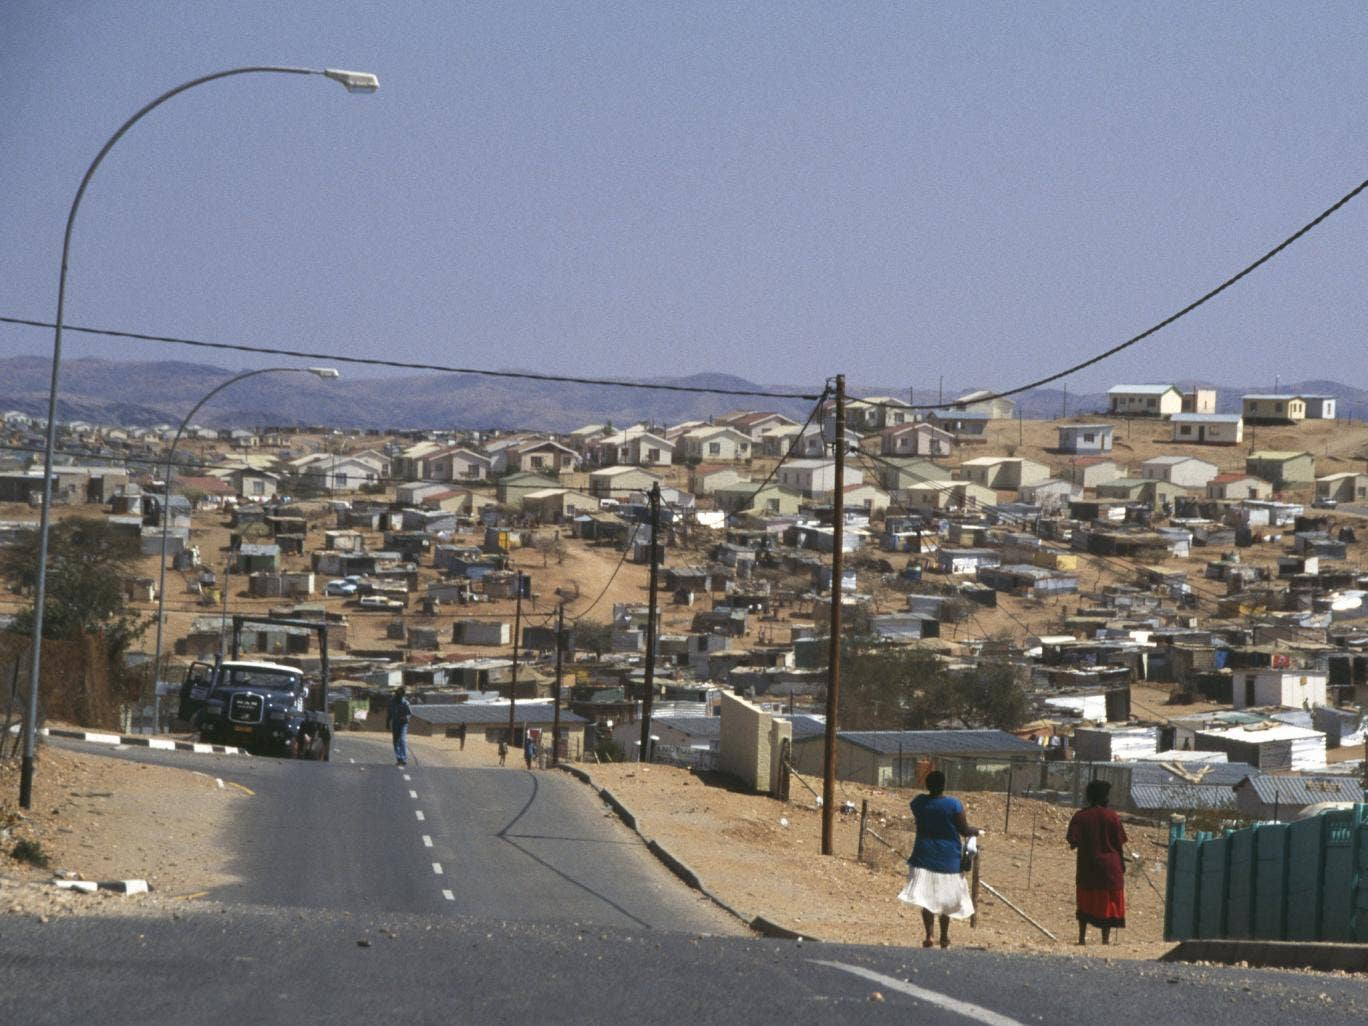 Katutura Black Township, located in Windhoek, Namibia